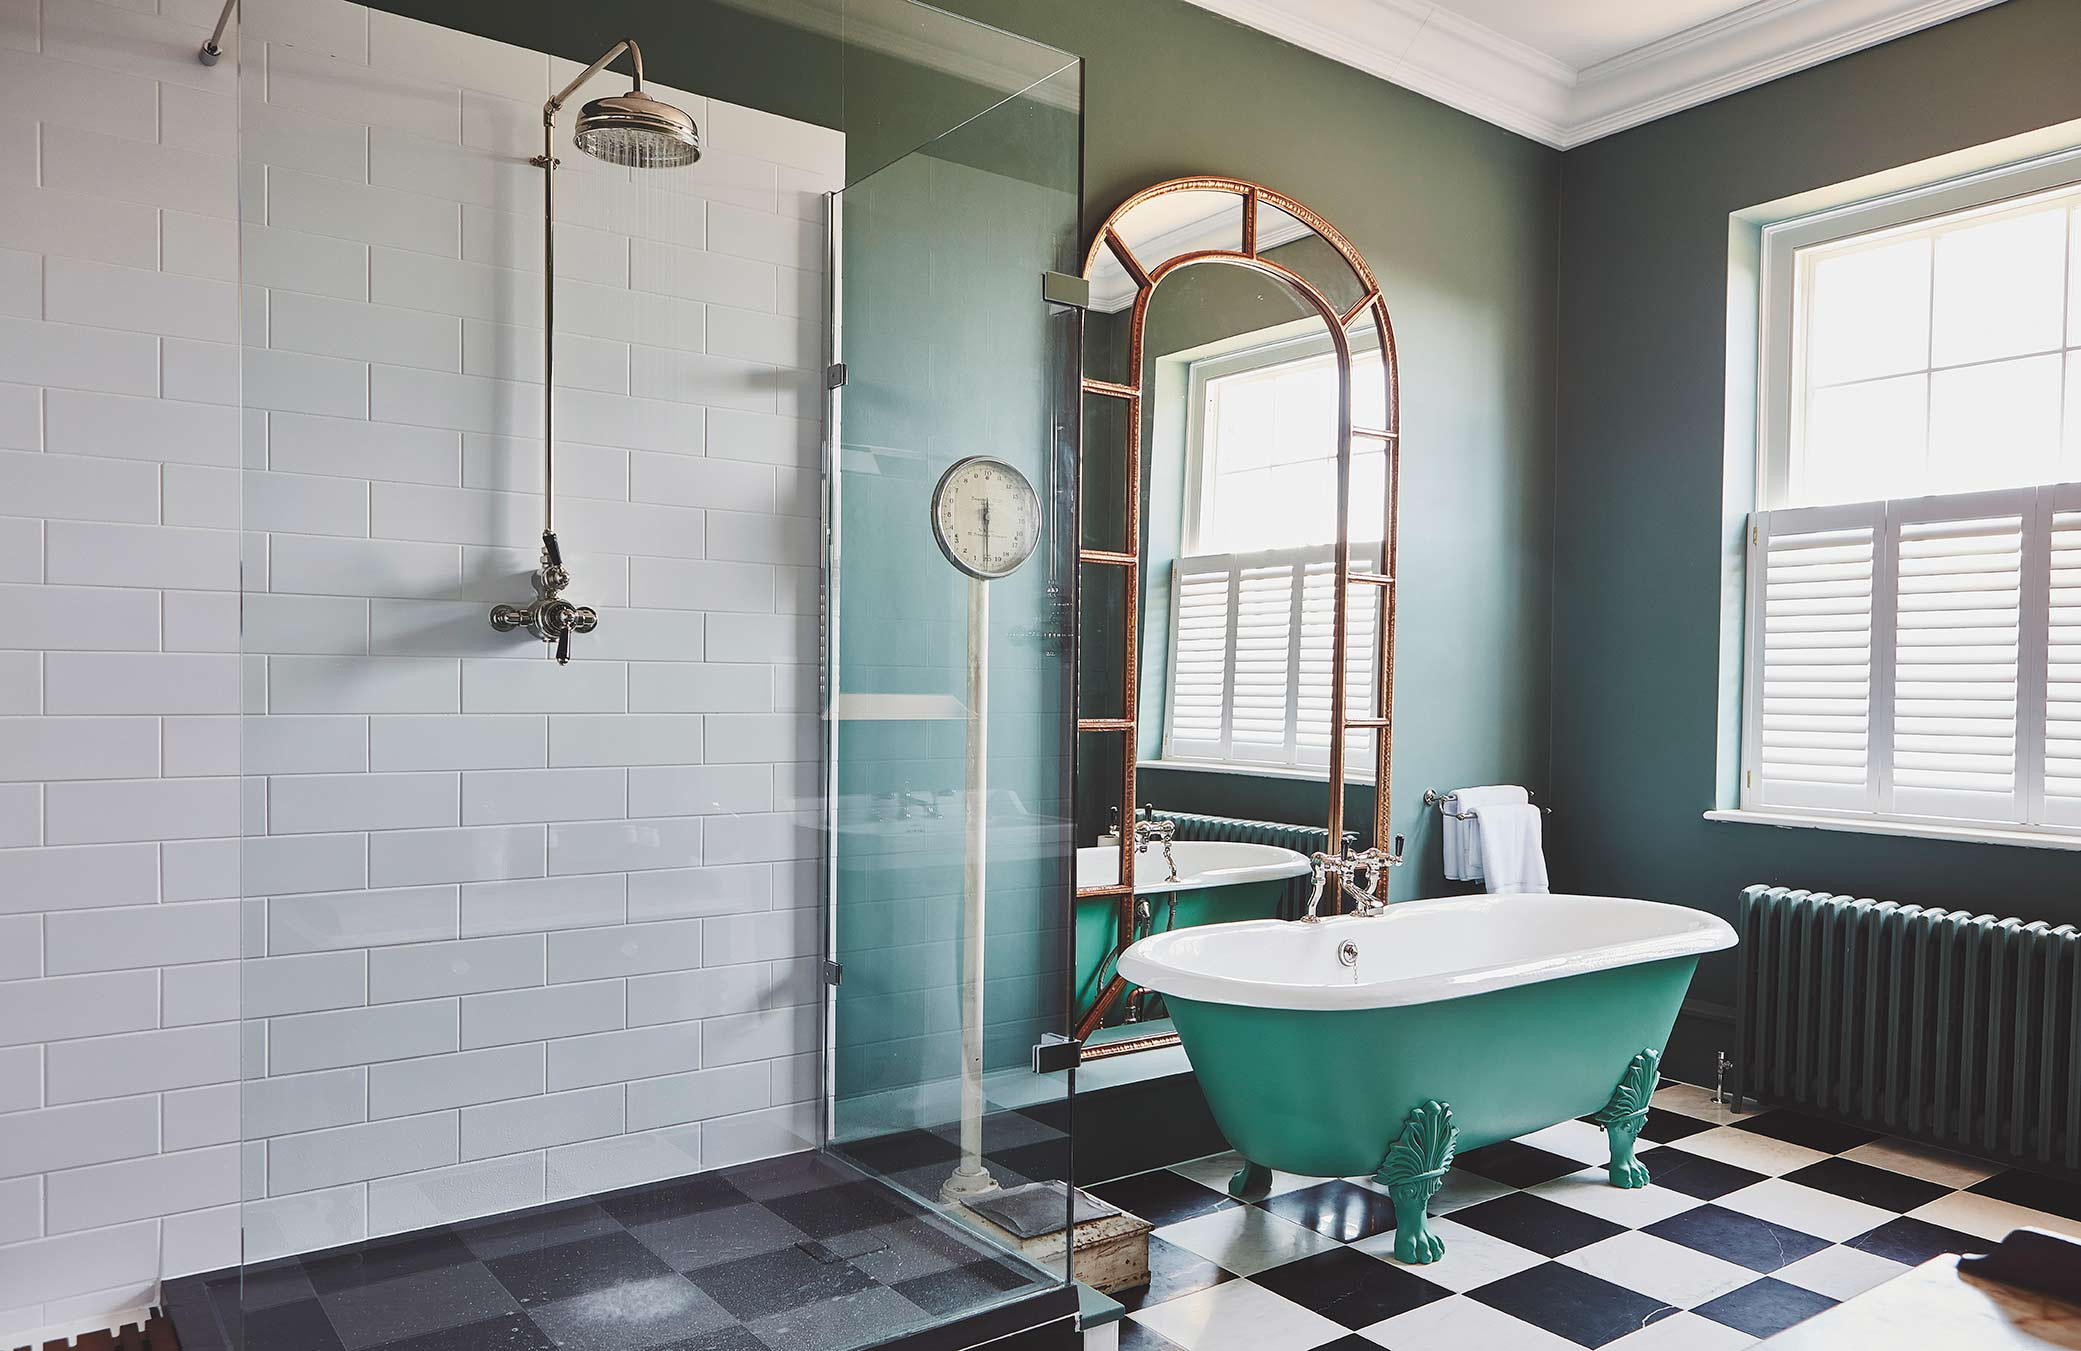 Perfect-Night-Bathroom-008-1.jpg